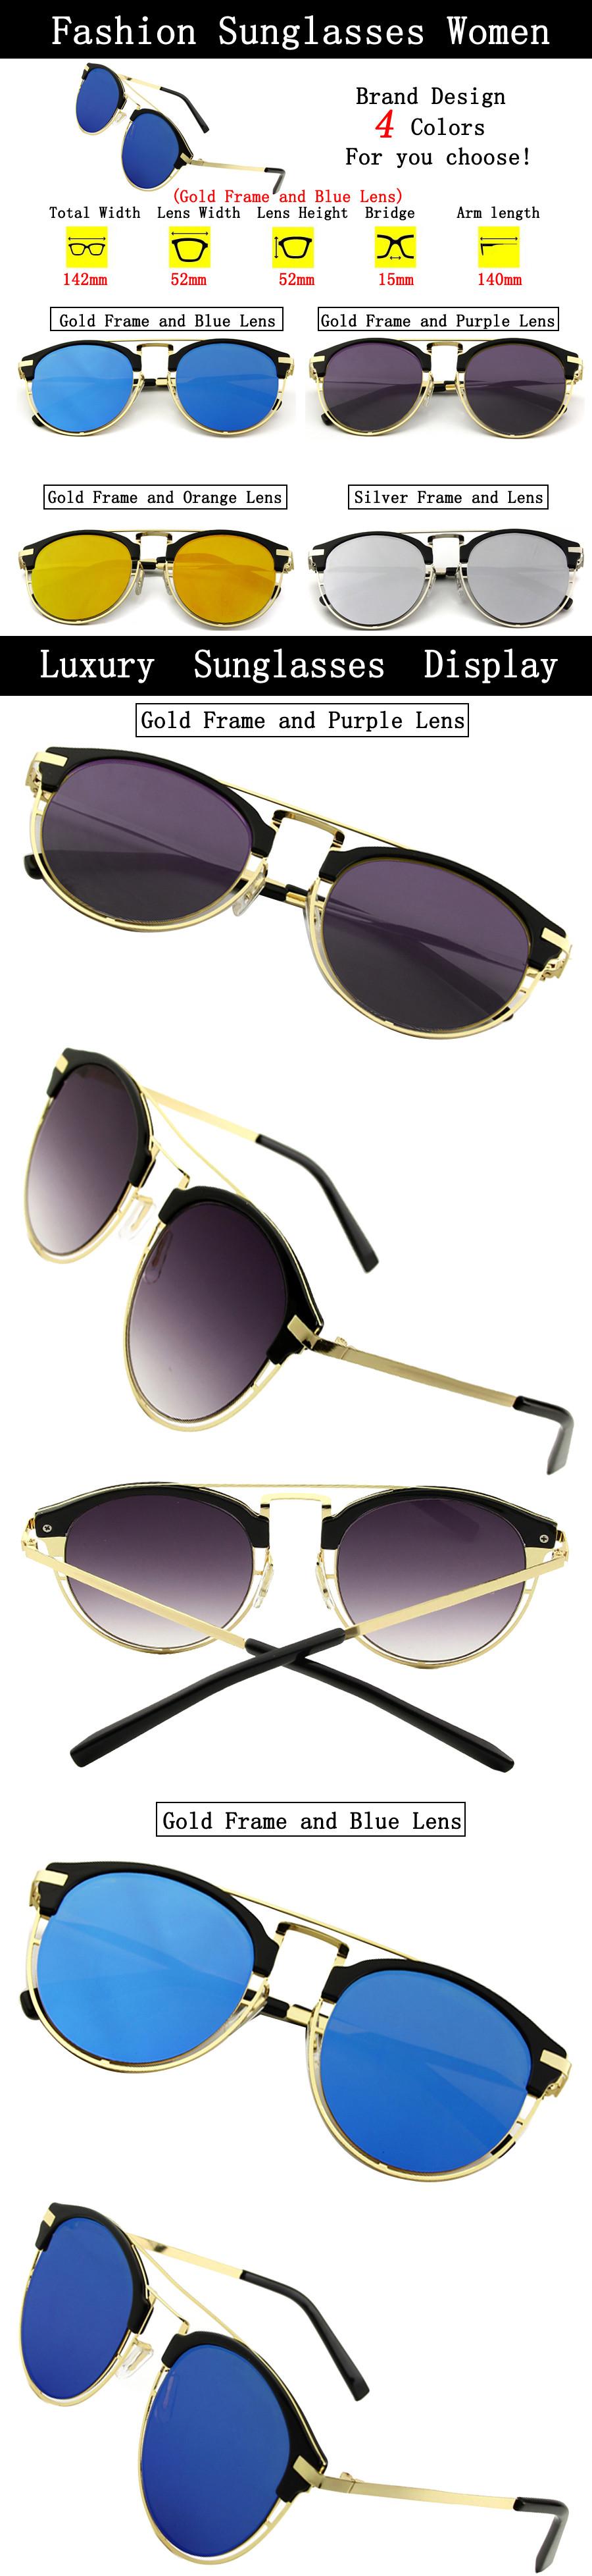 SGS6566-Sunglasses Display